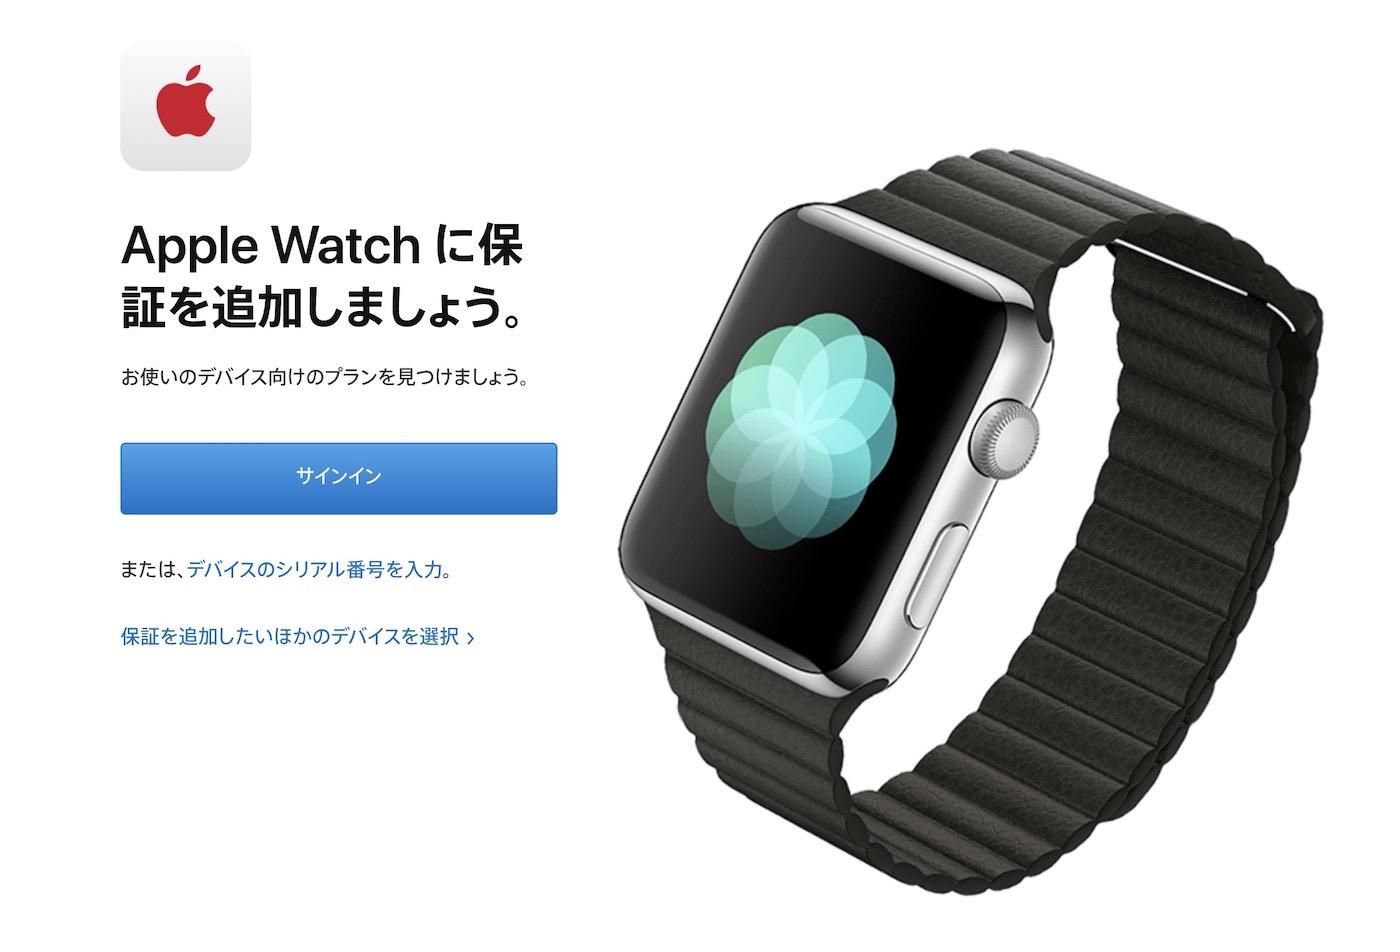 Apple Watch アップルケア